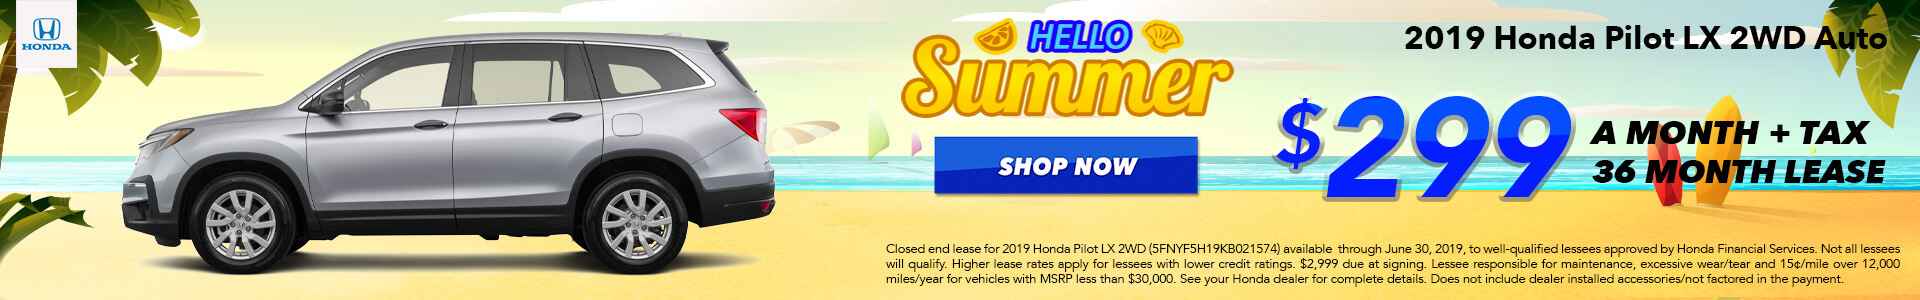 2019 Honda Pilot LX Lease for $299